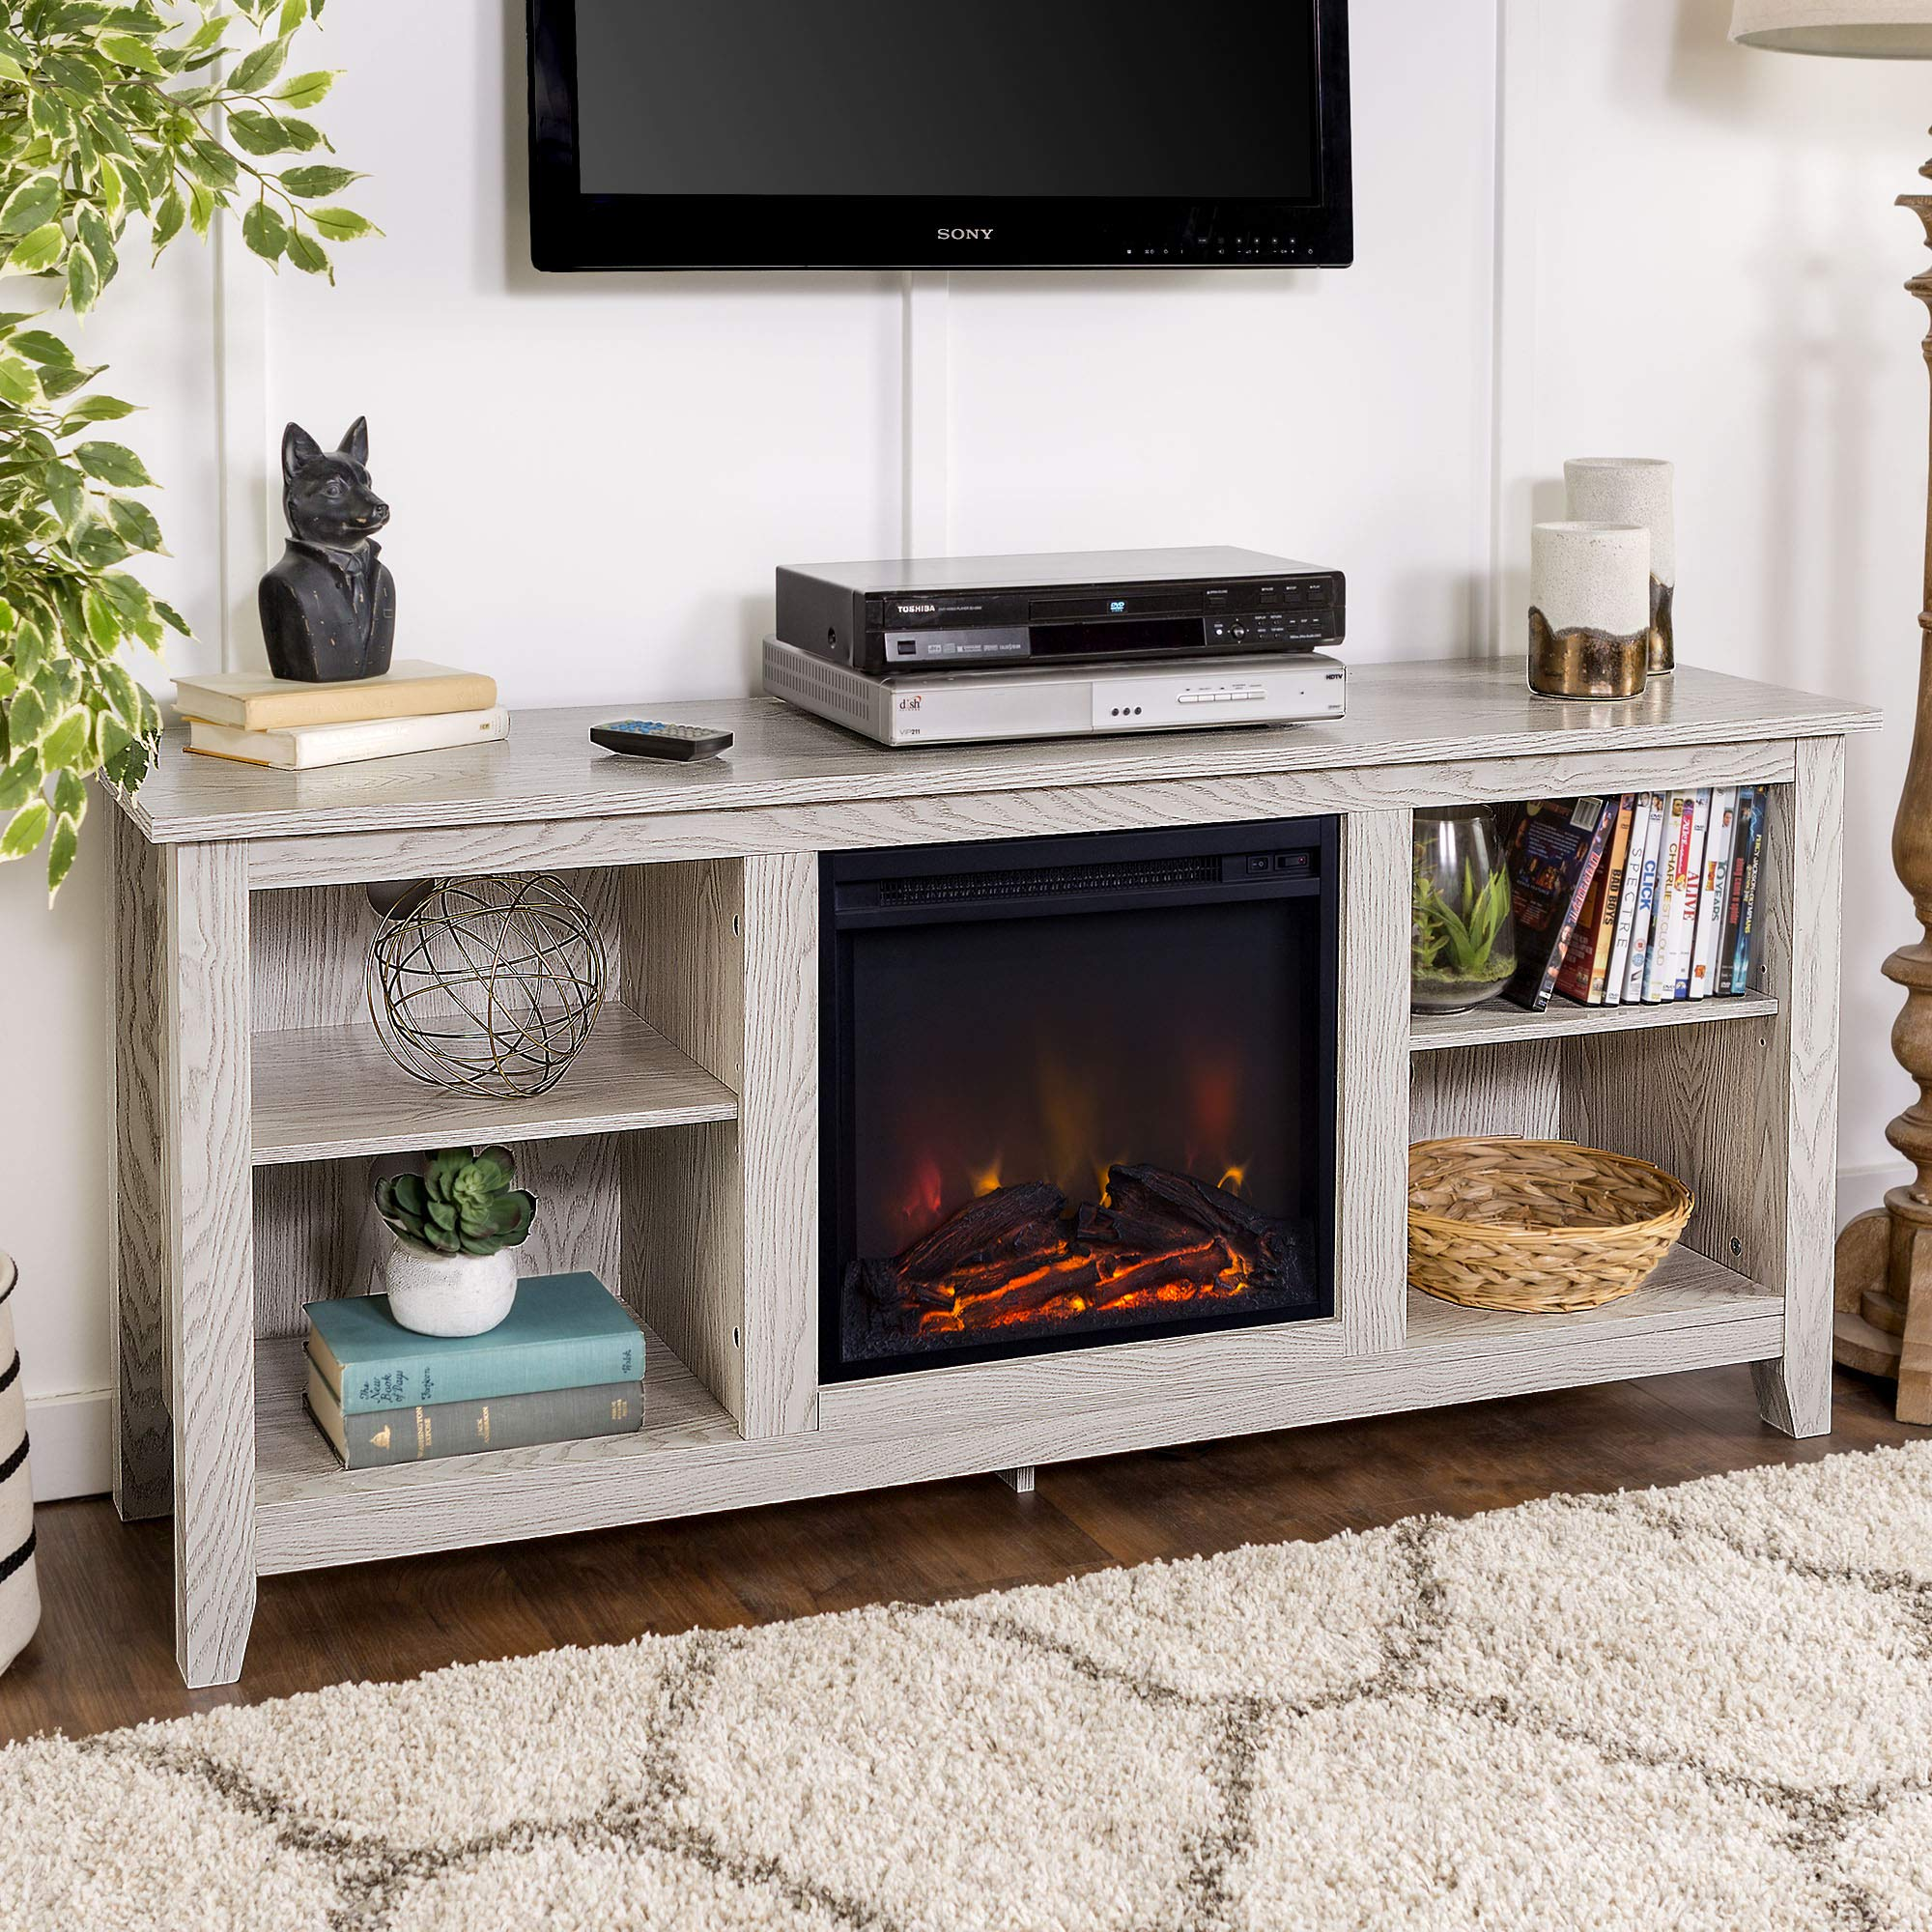 W. diseño madera chimenea media TV Soporte consola: Amazon.es: Hogar